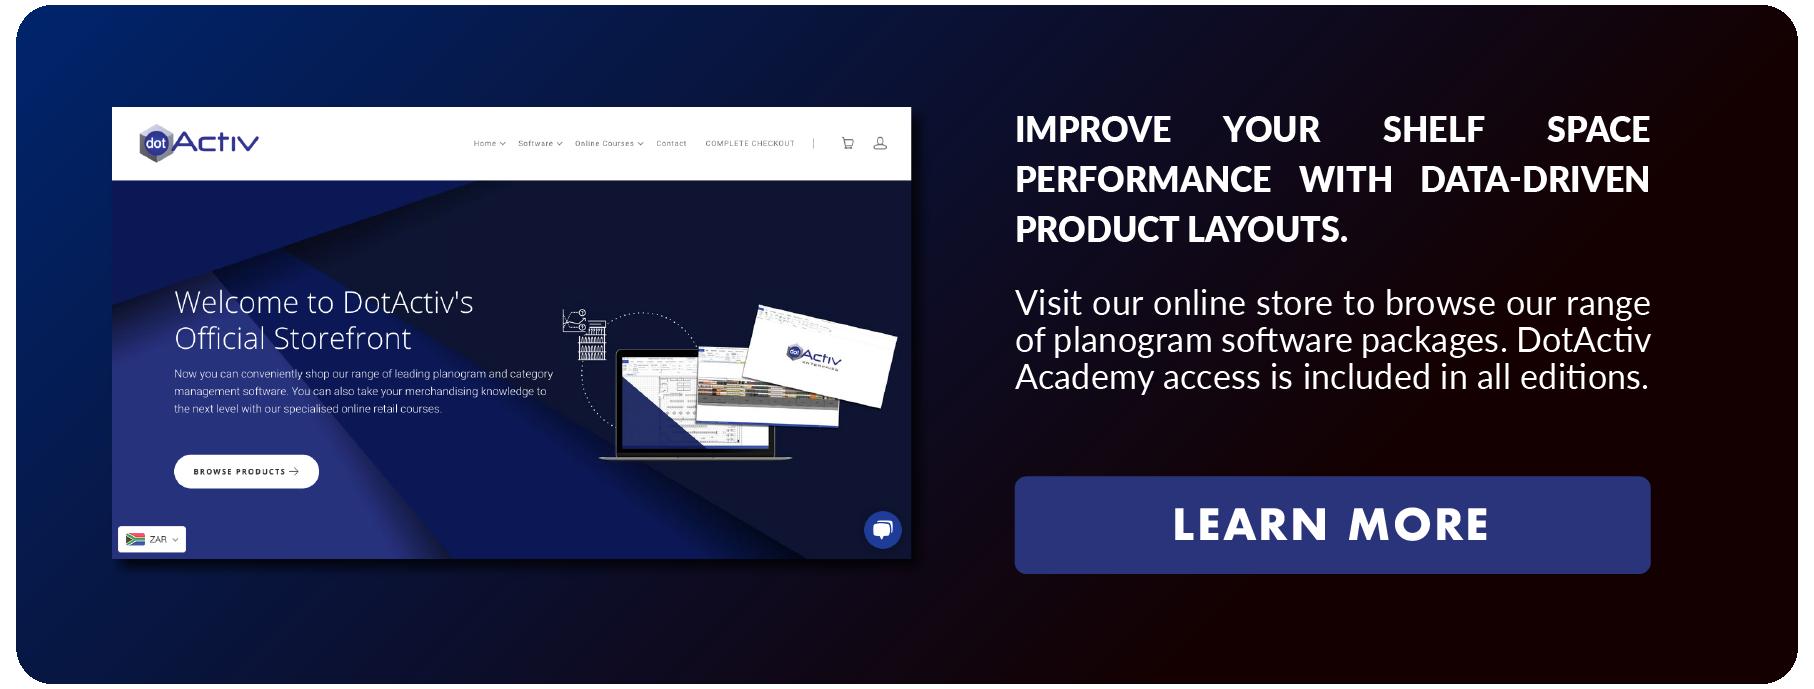 Data-Driven Product Layouts Dark Blue